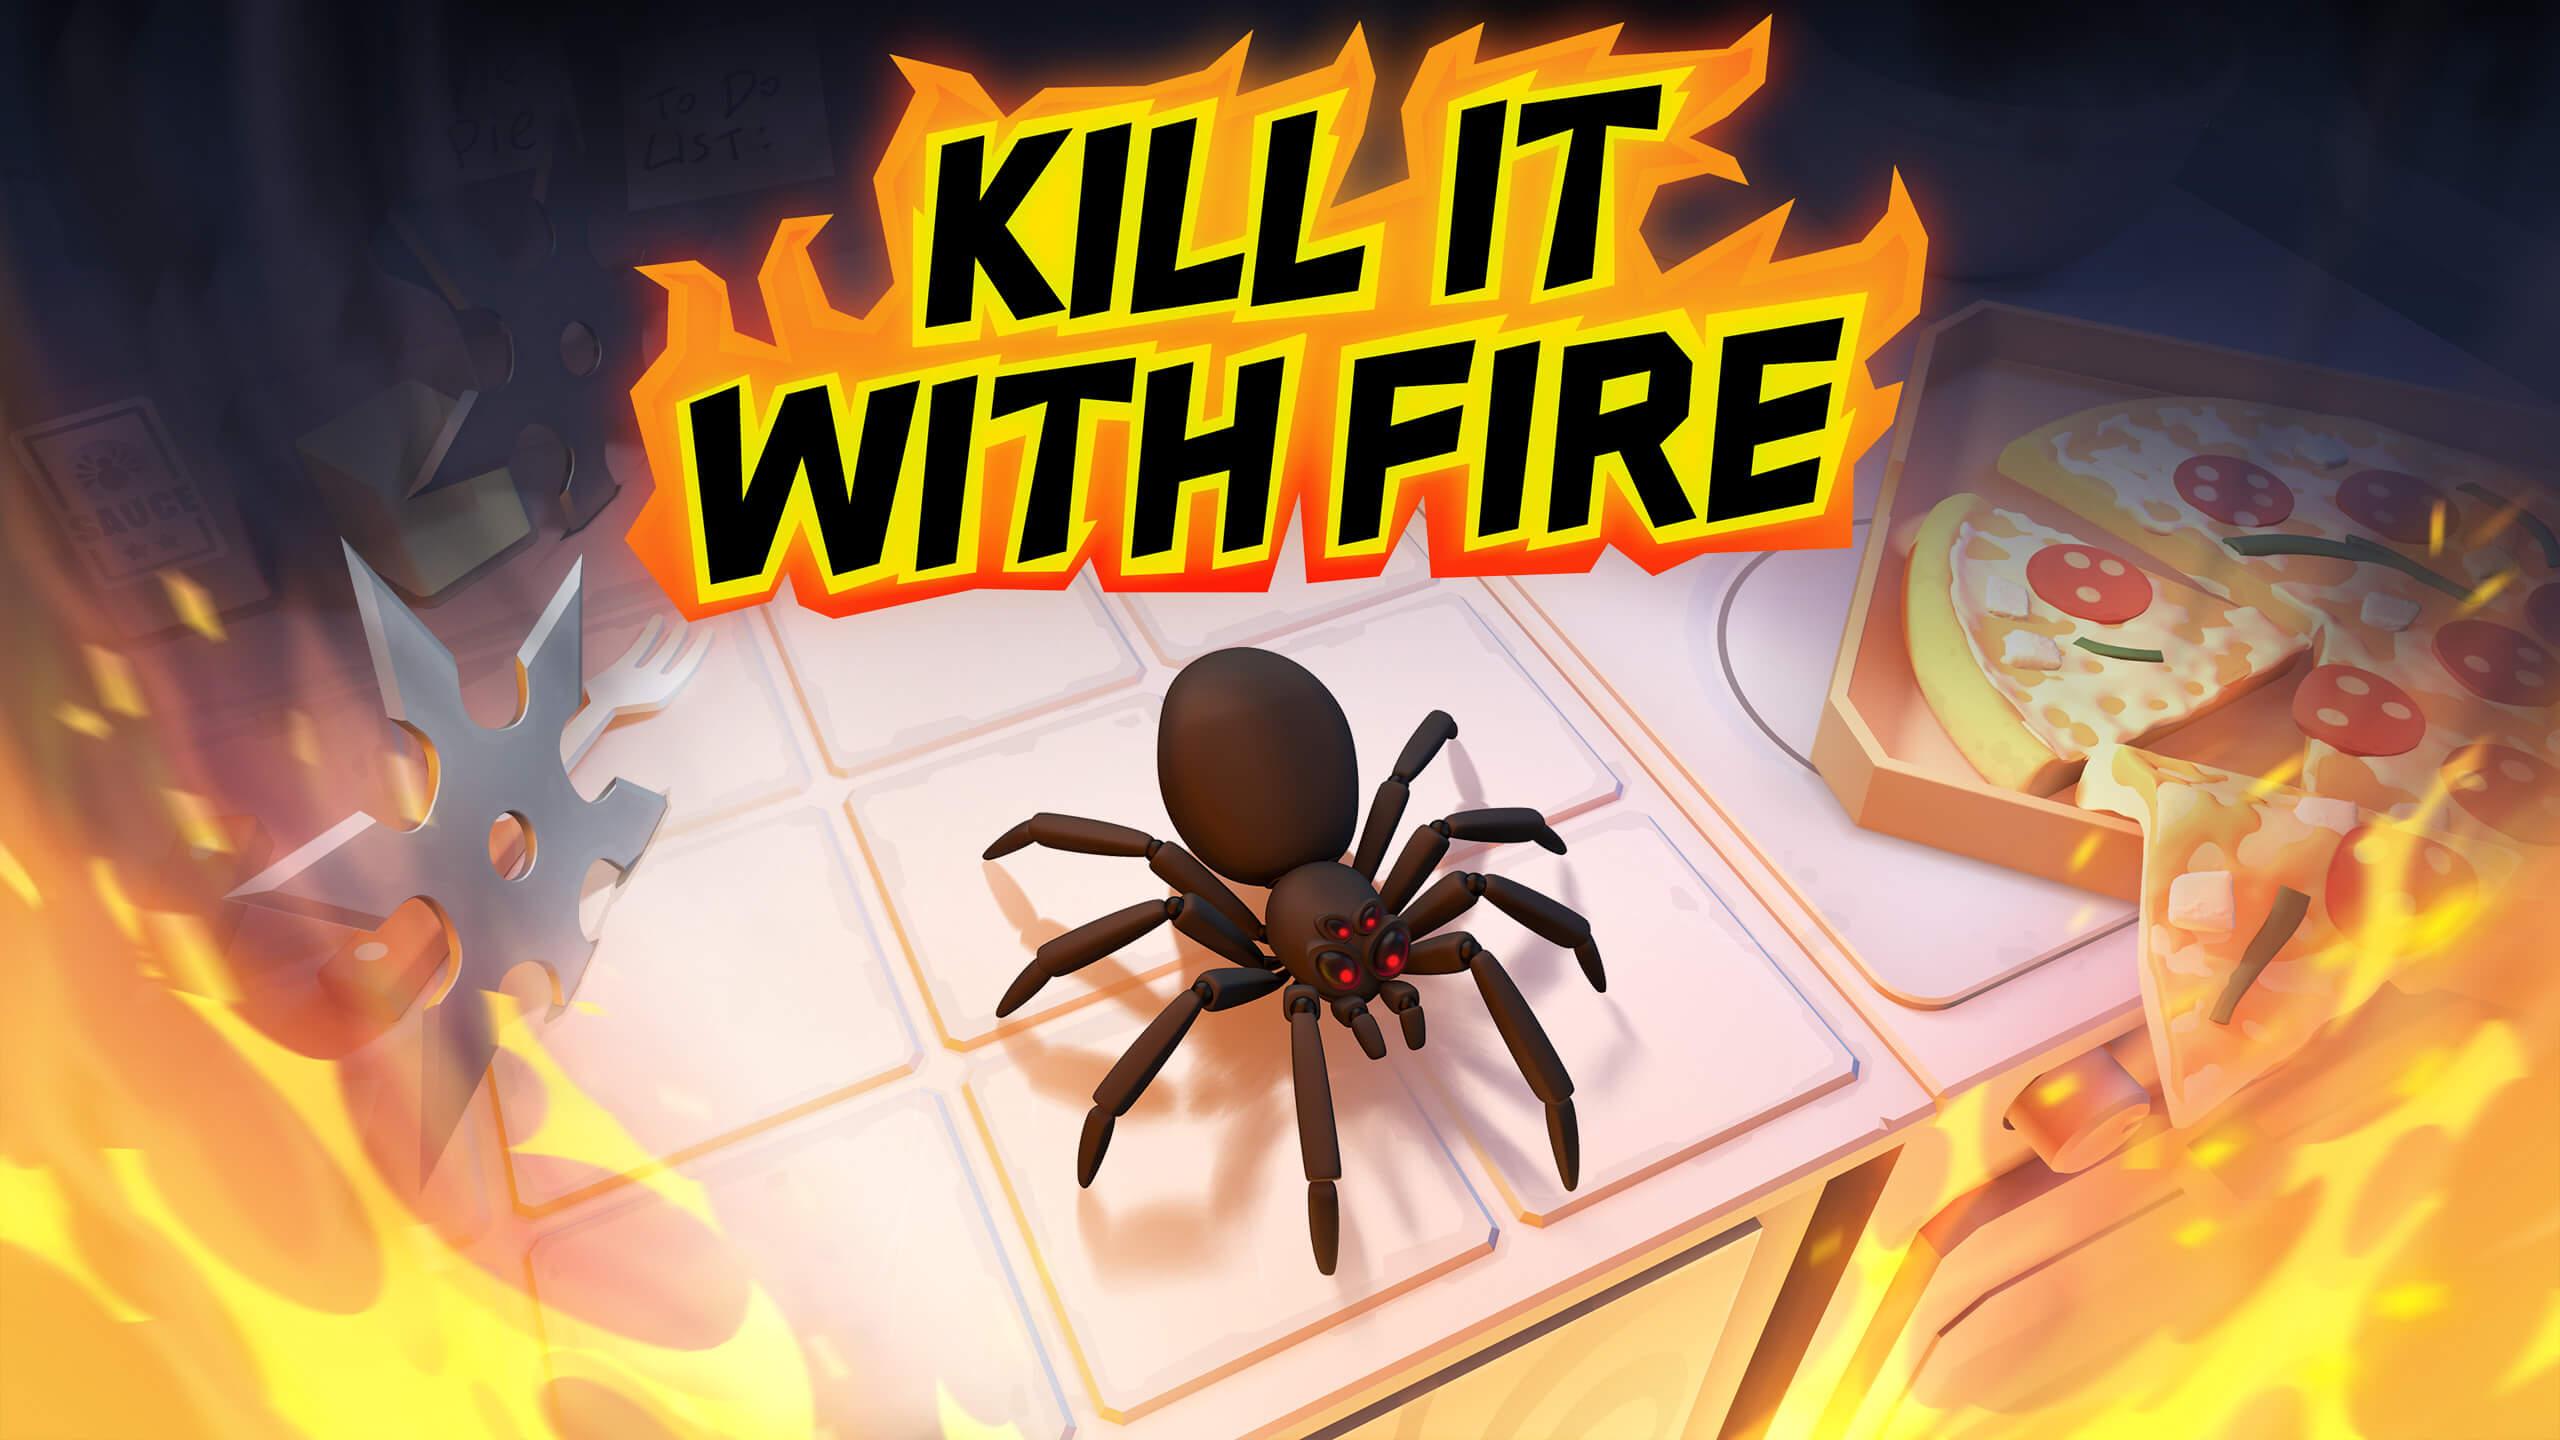 燃烧吧,蜘蛛(Kill It With Fire)插图5